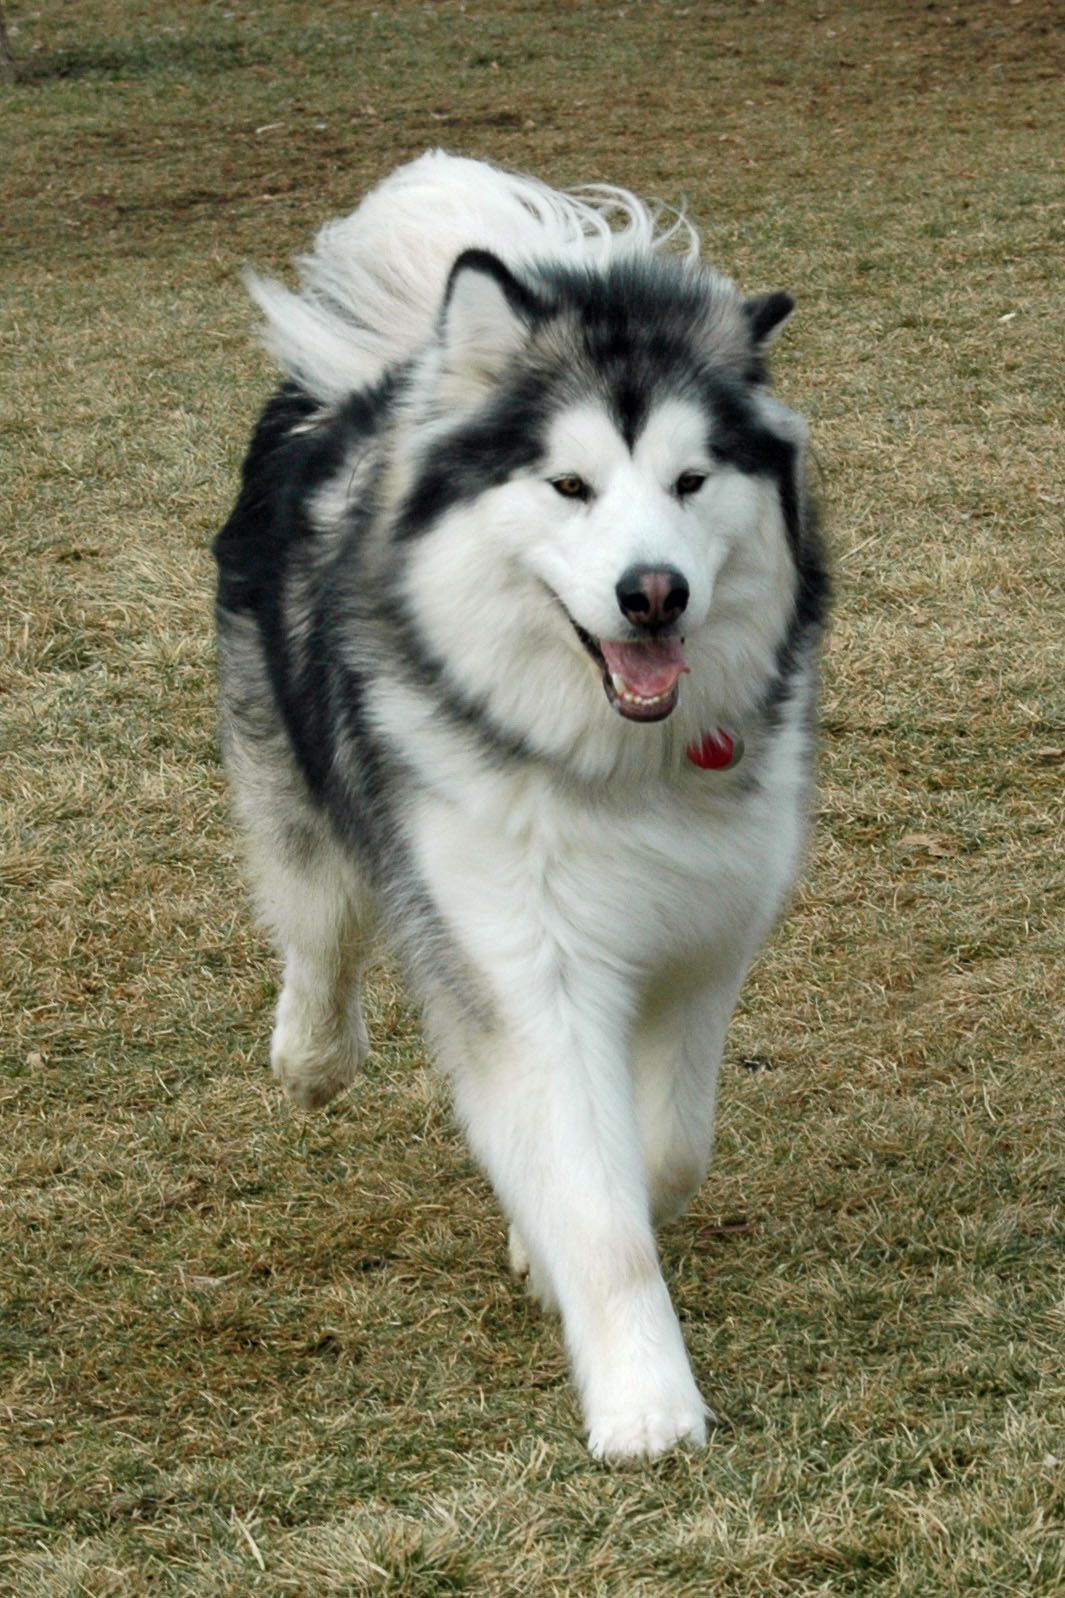 How To Groom An Alaskan Malamute Malamute Dog Alaskan Malamute